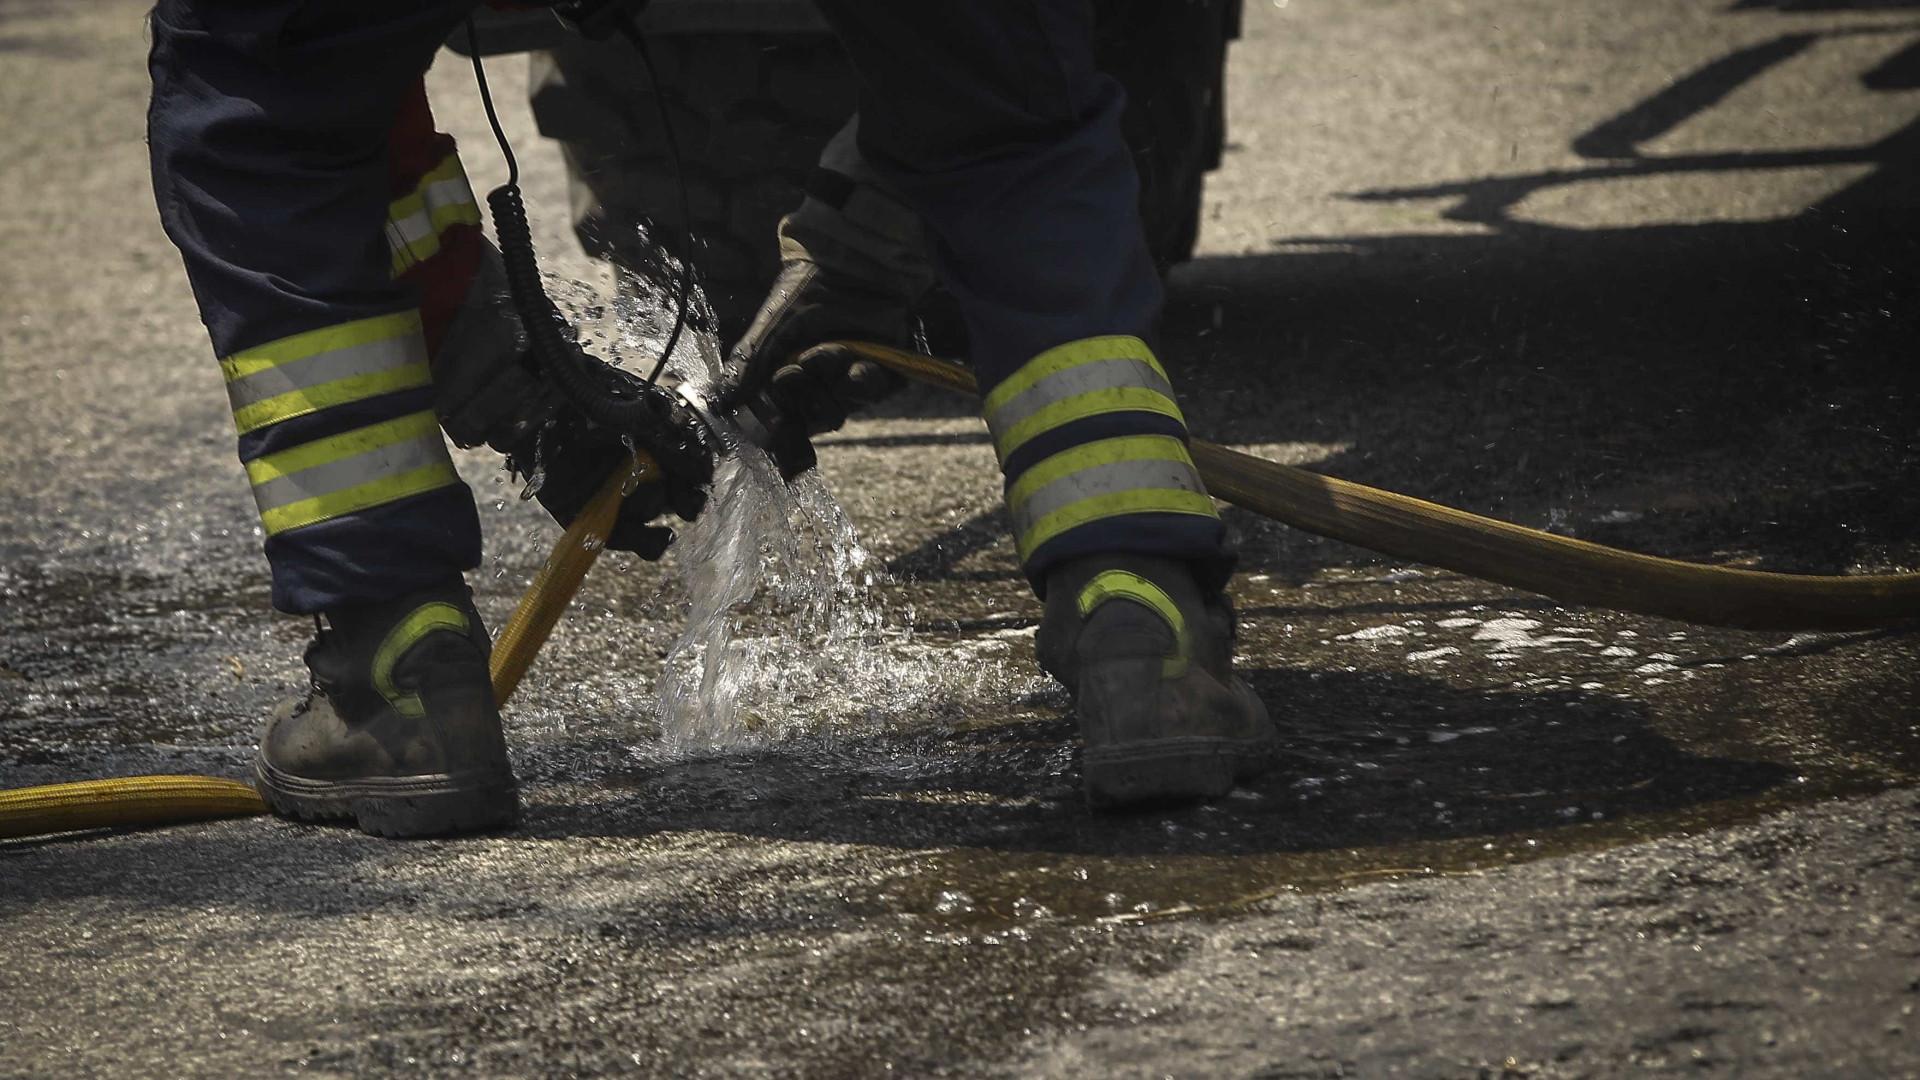 Idoso encontrado carbonizado após perder controlo de queimada